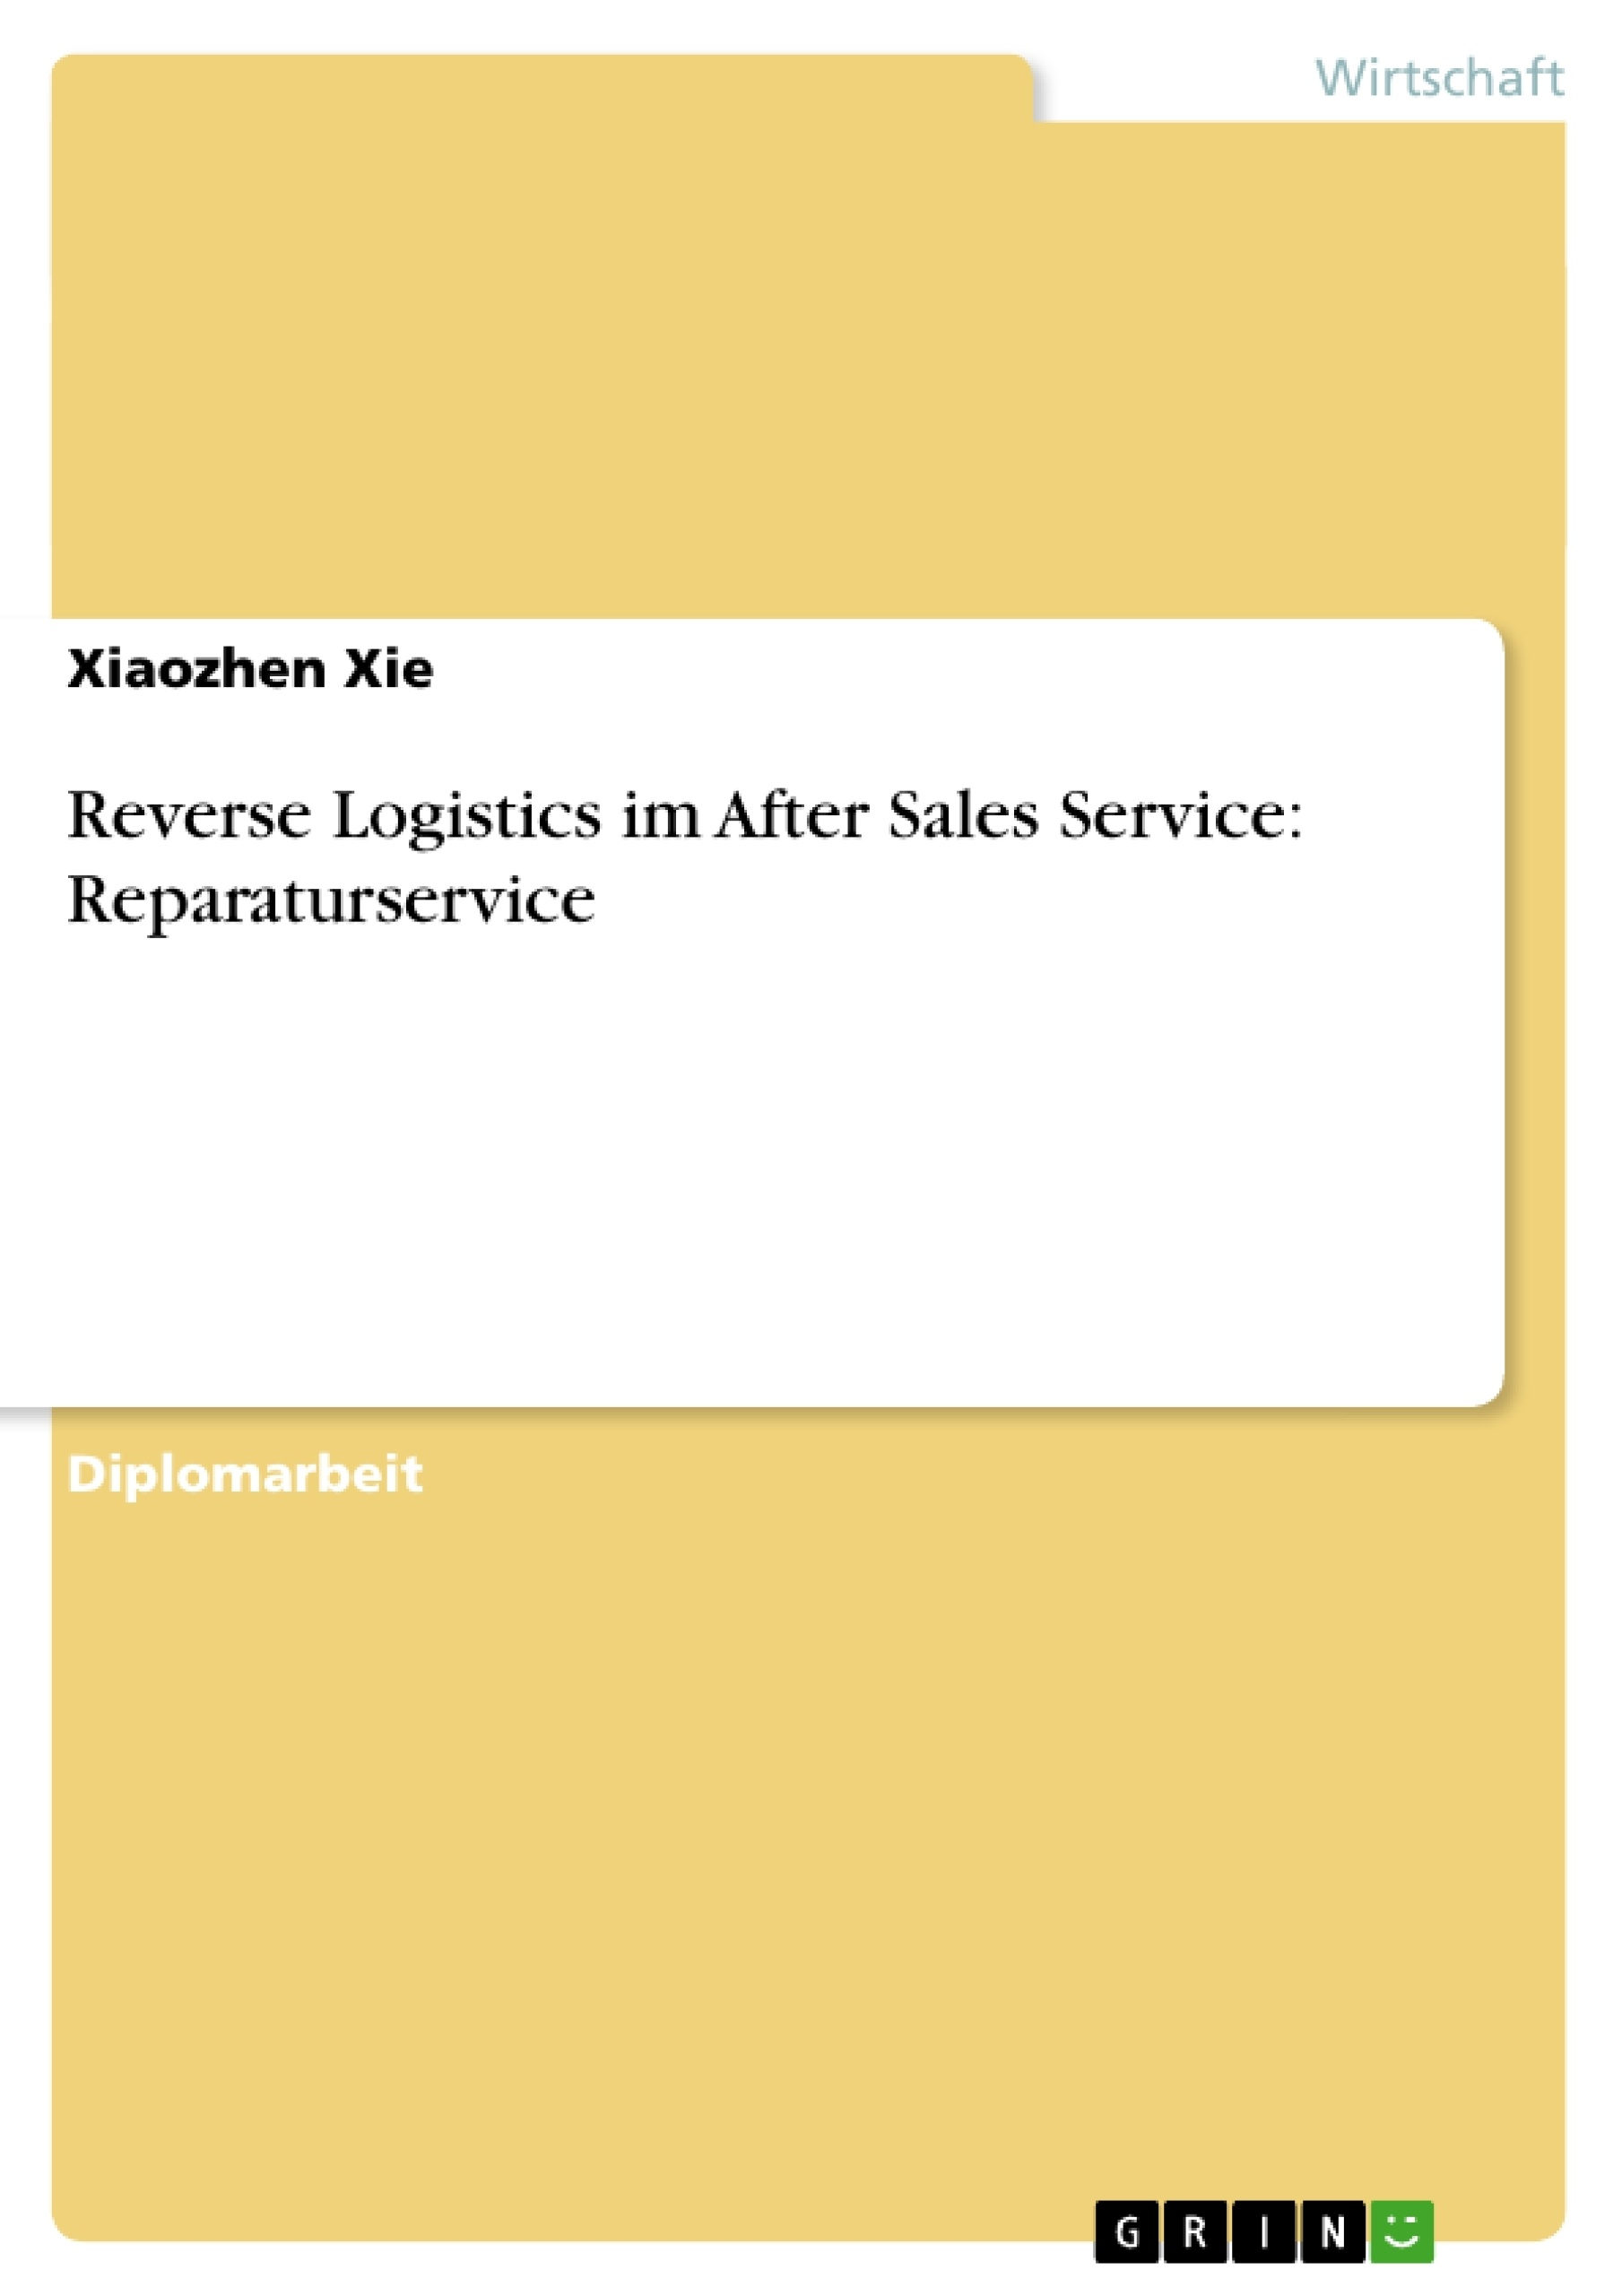 Titel: Reverse Logistics im After Sales Service: Reparaturservice